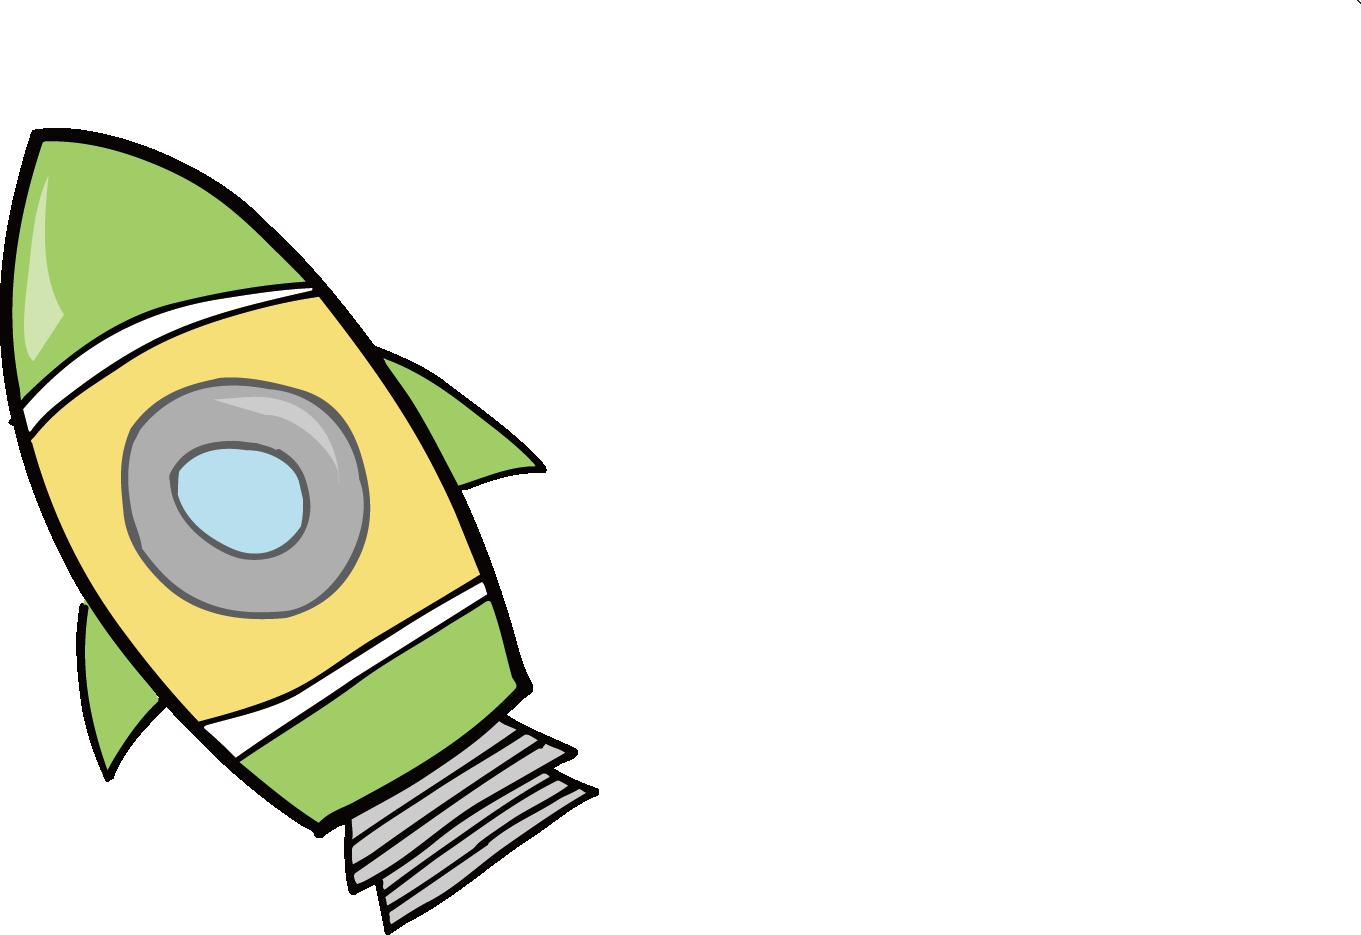 1361x935 Cartoon Rocket Drawing